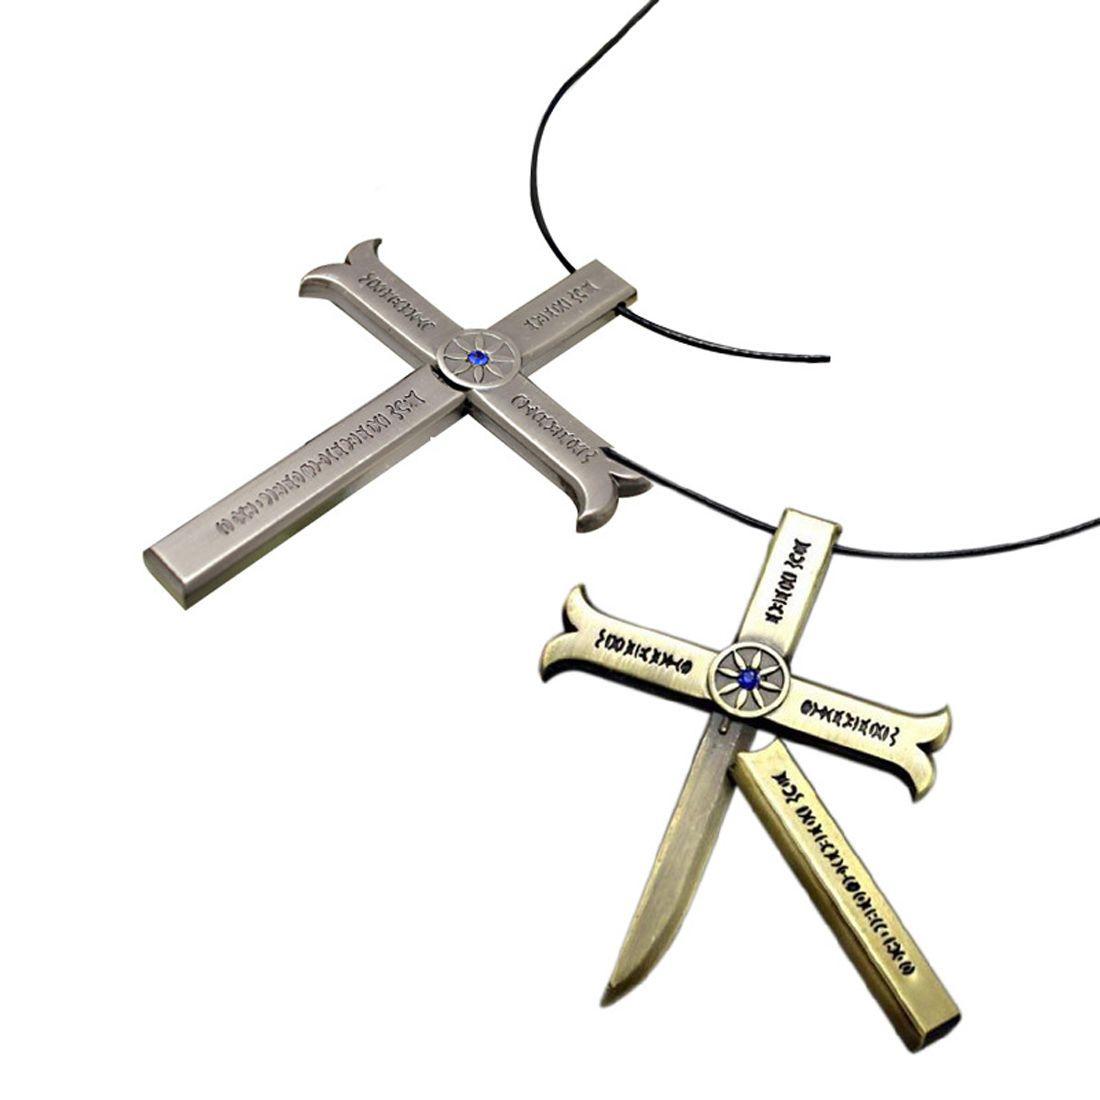 One Piece Hawk-Eye Dracule Mihawk Kogatana Cross Sword Cosplay Pendant Necklace